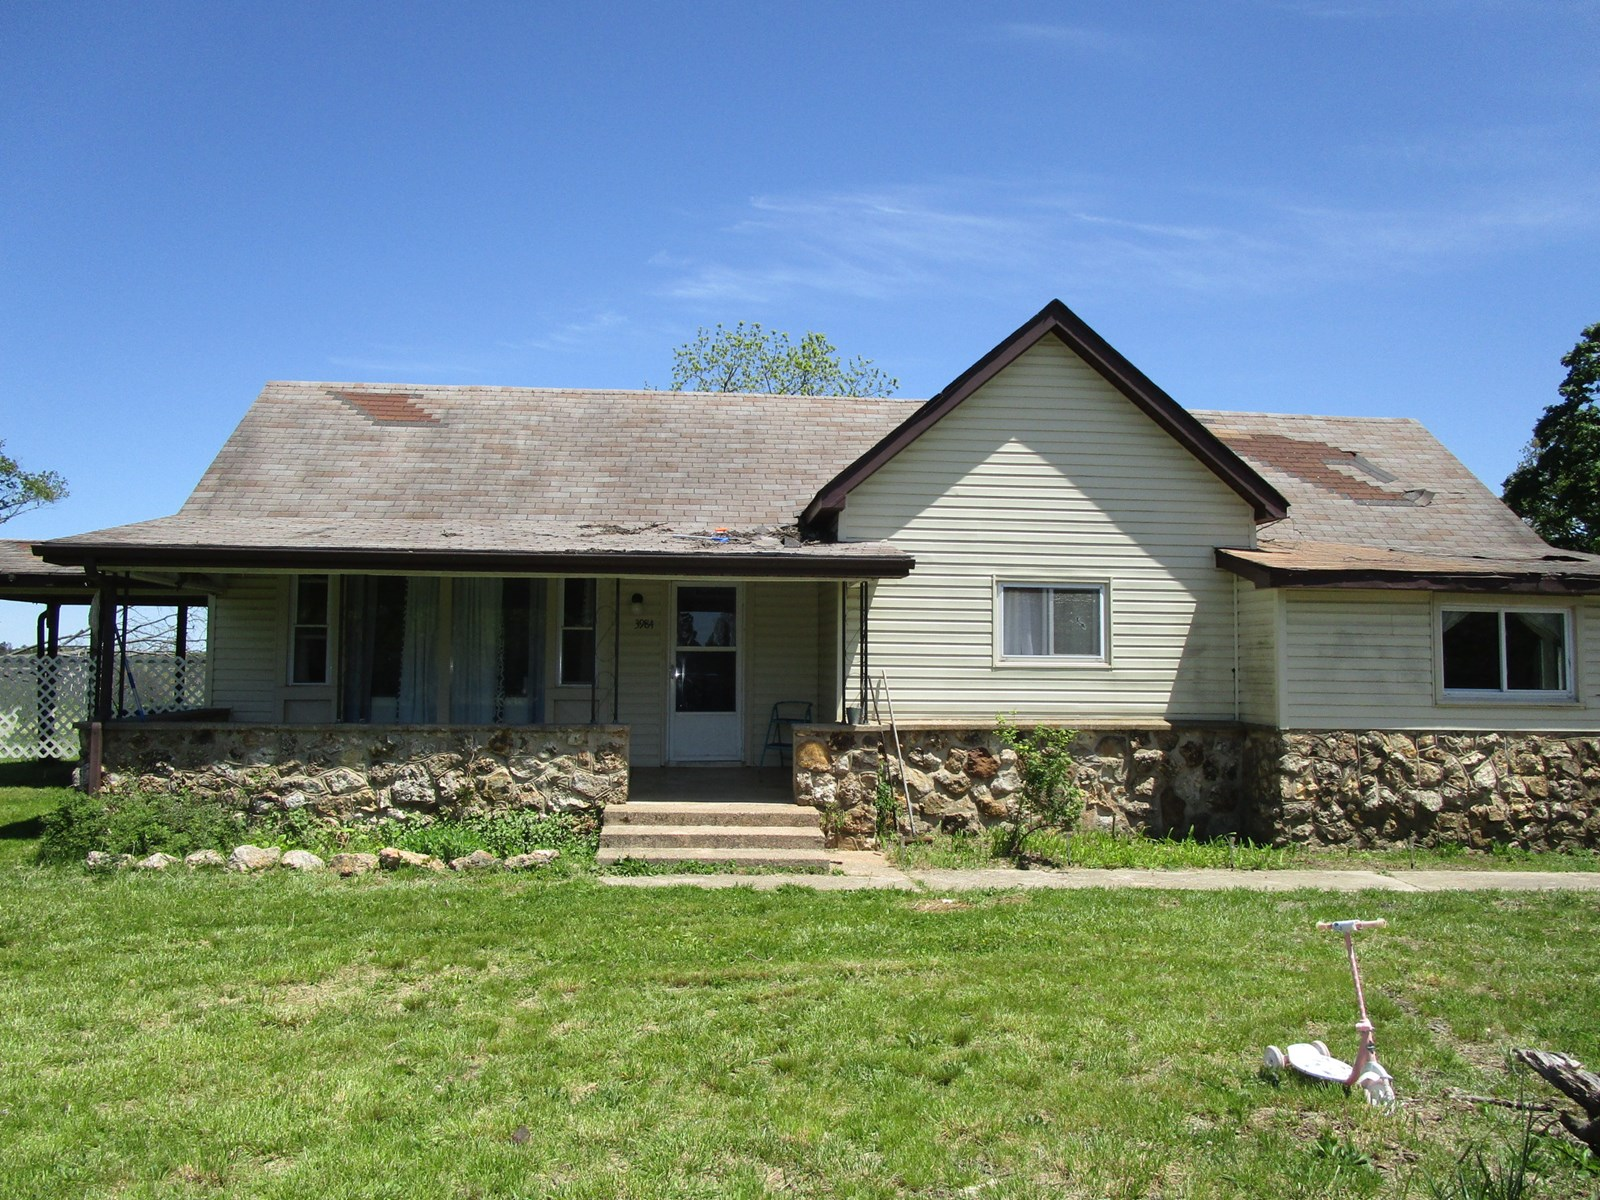 Hobby Farm for Sale in Southern Missouri Ozarks